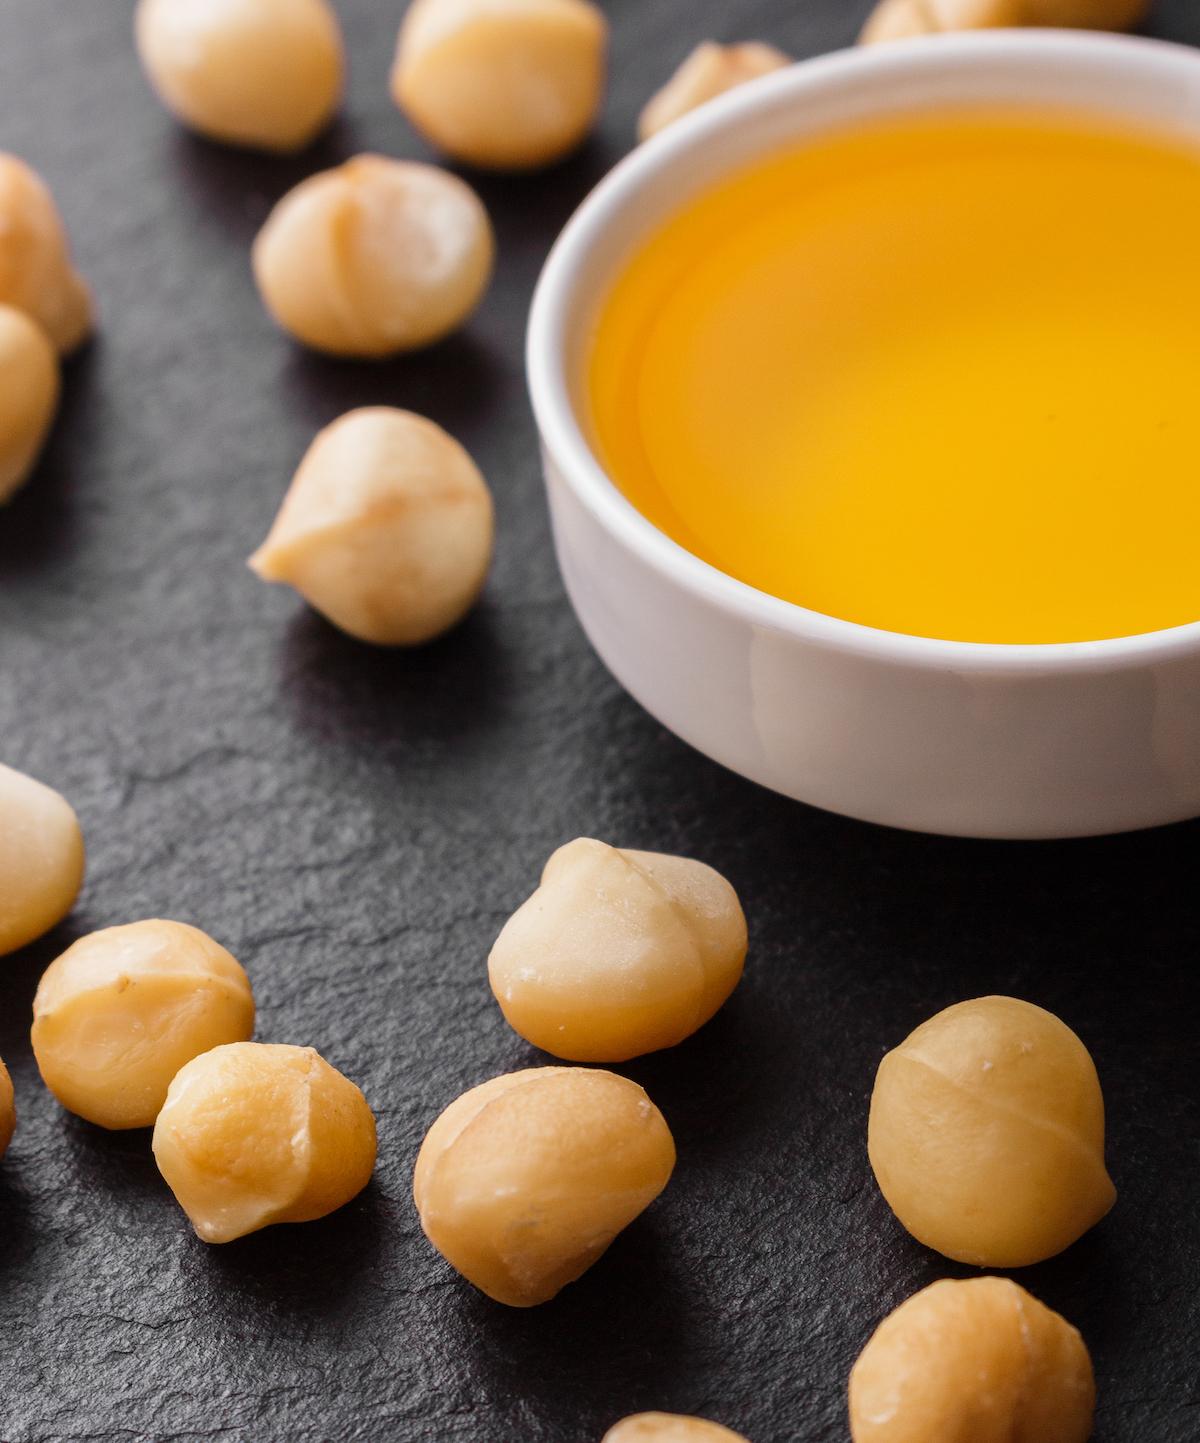 Huile de noix de macadamia ©Narsil shutterstock